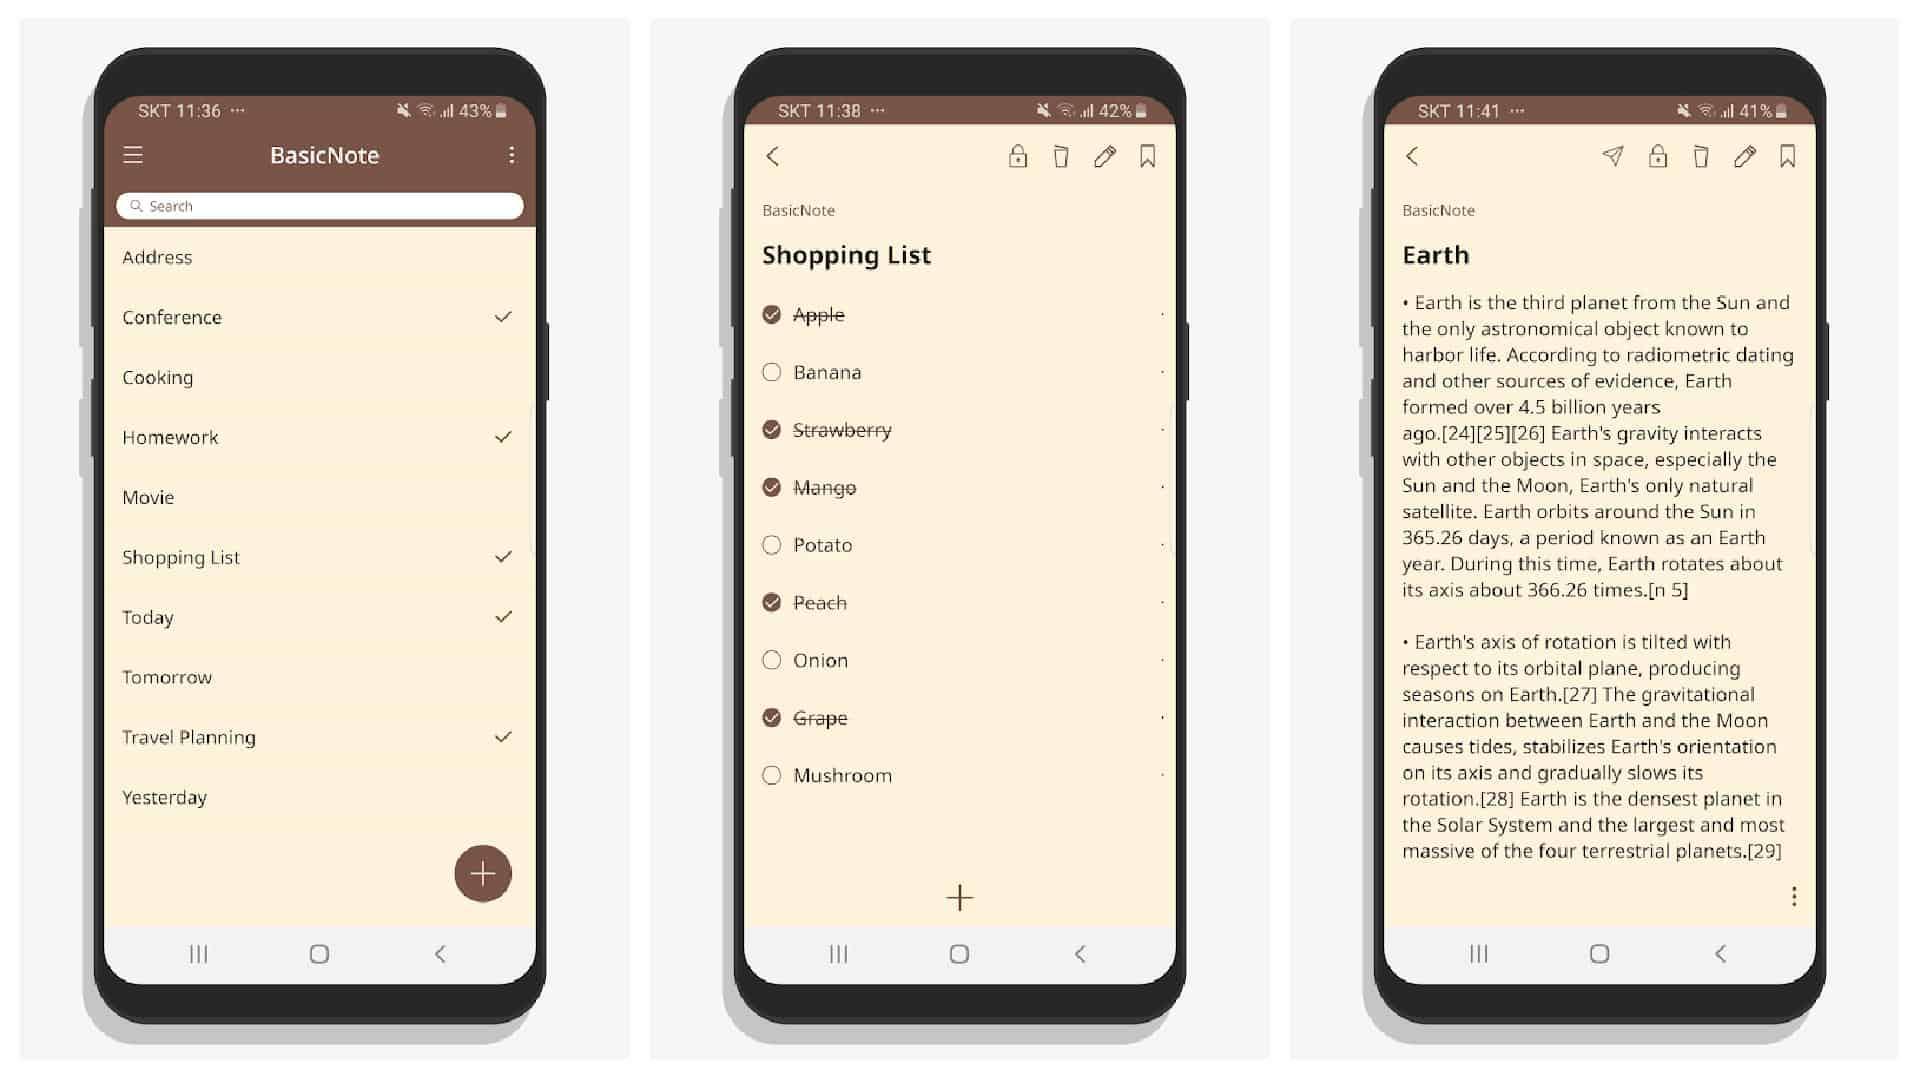 BasicNote app grid 1